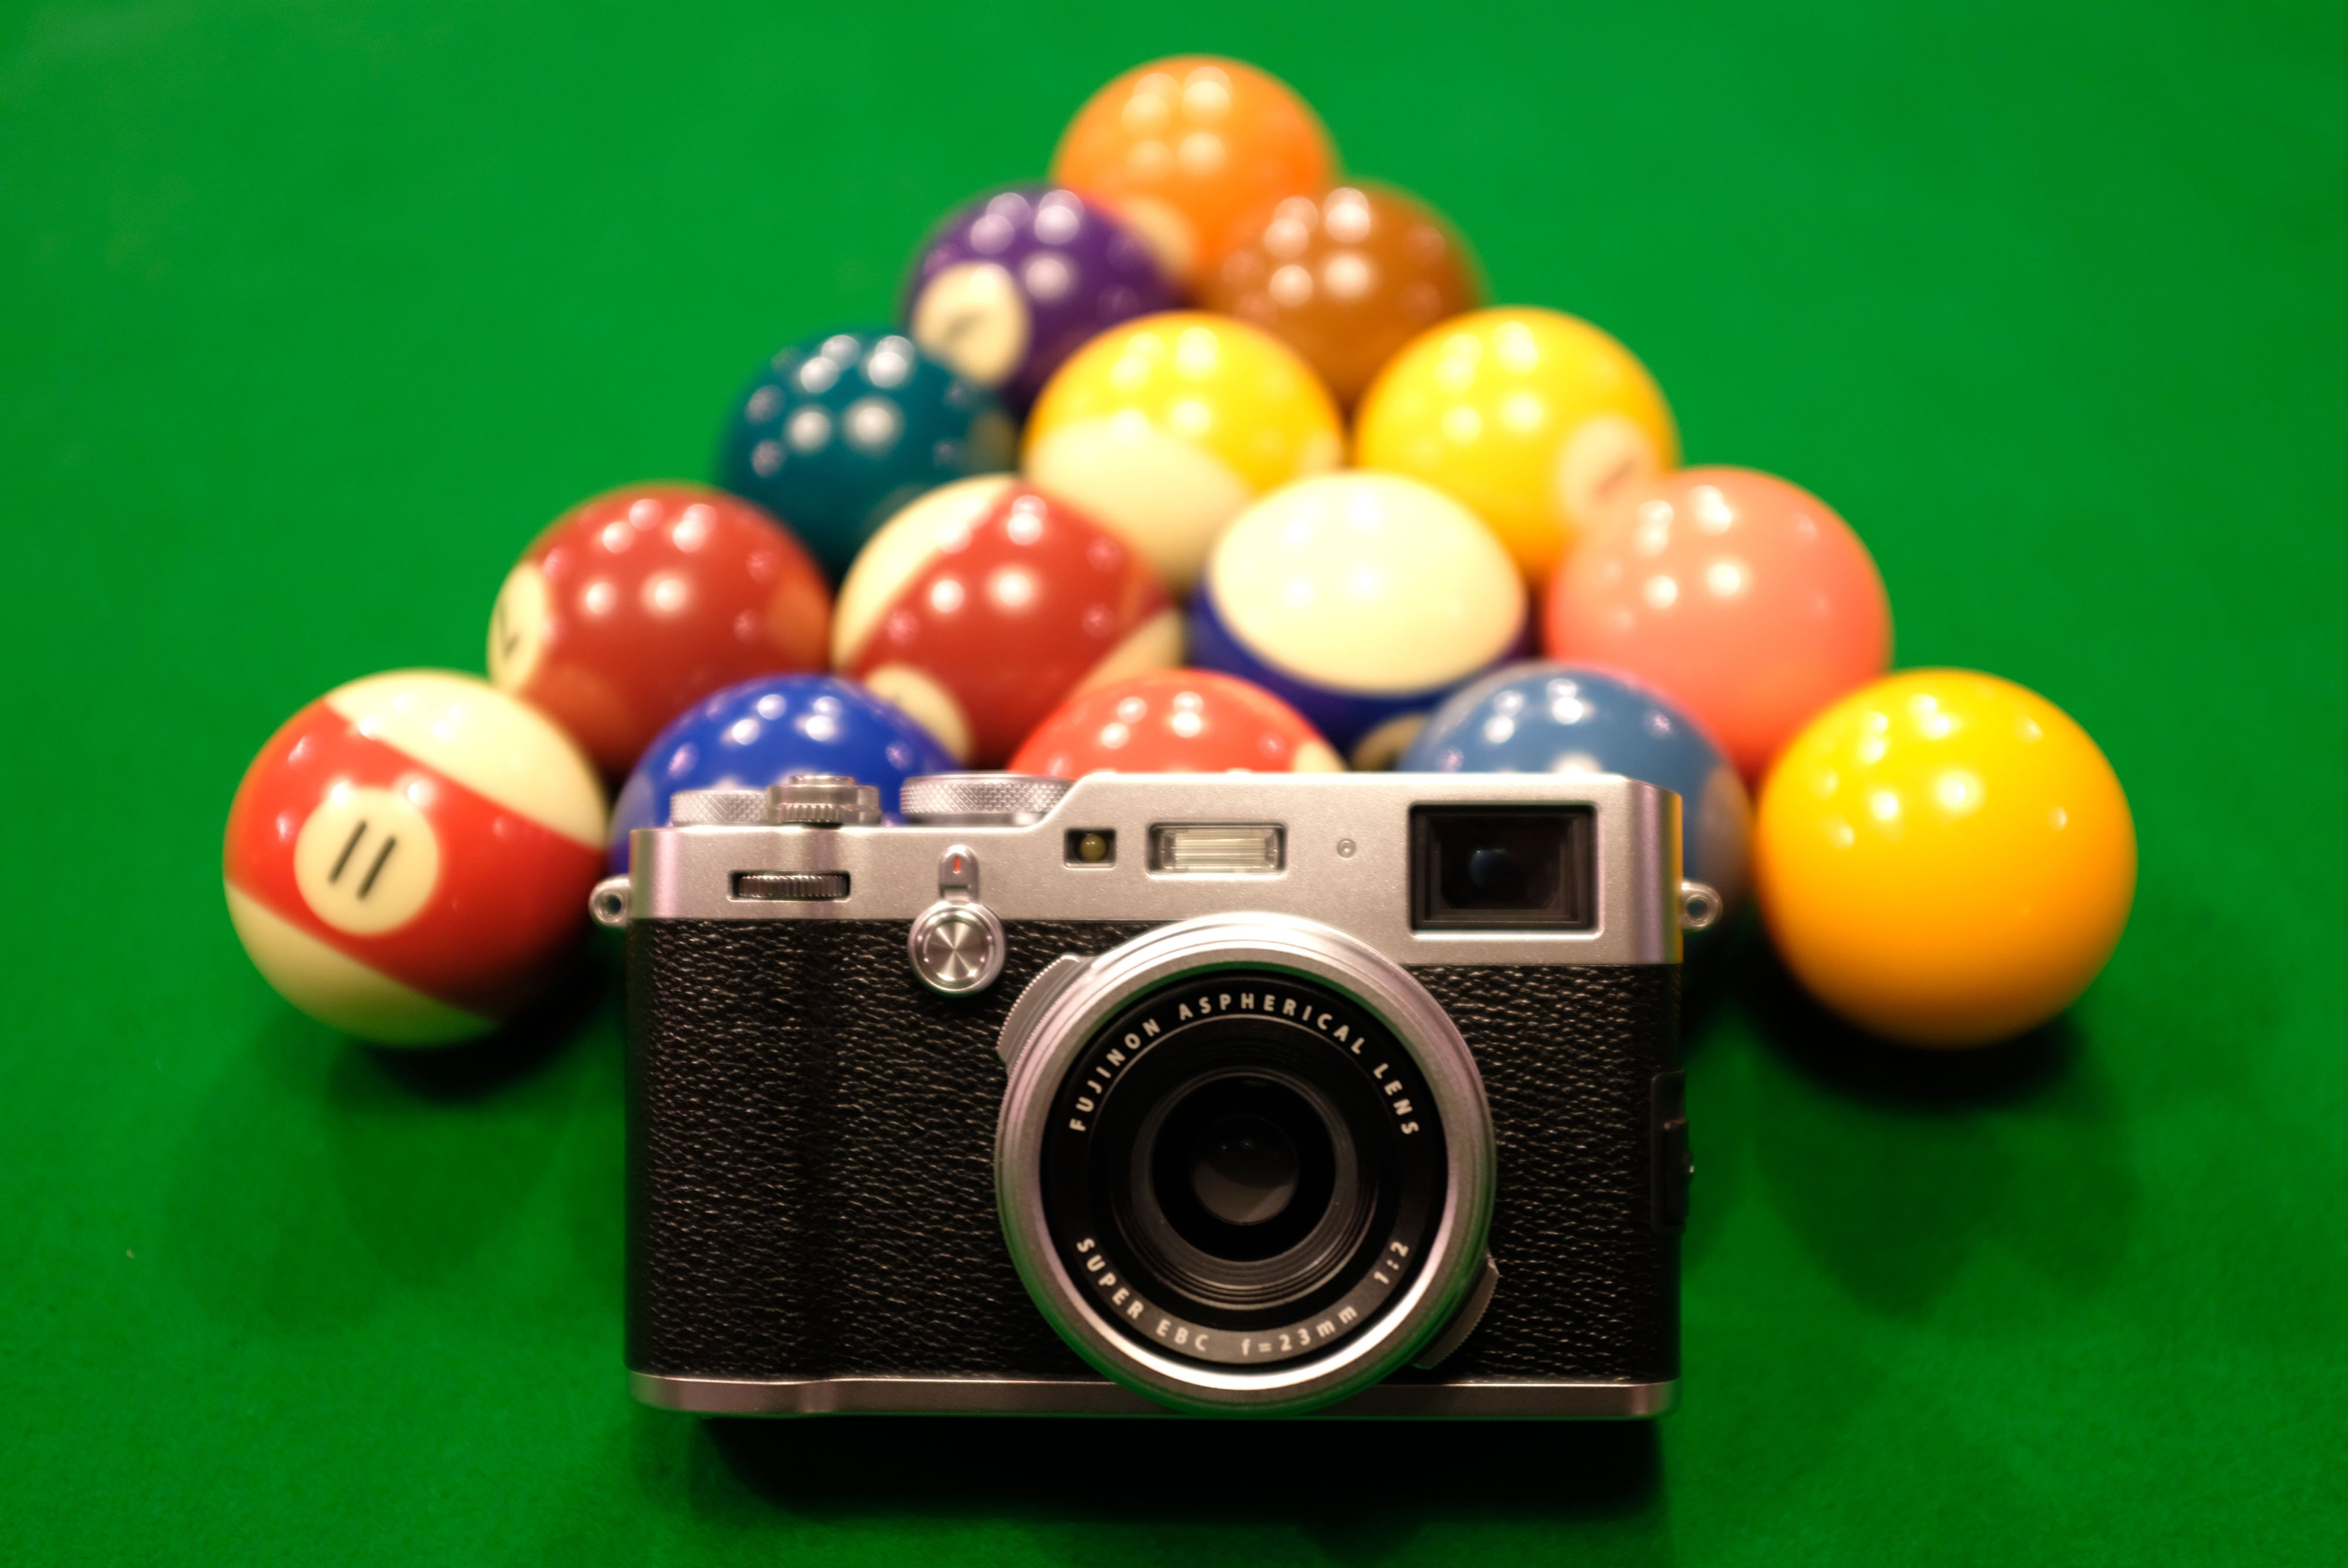 Fujifilm camera reviews - | Cameralabs